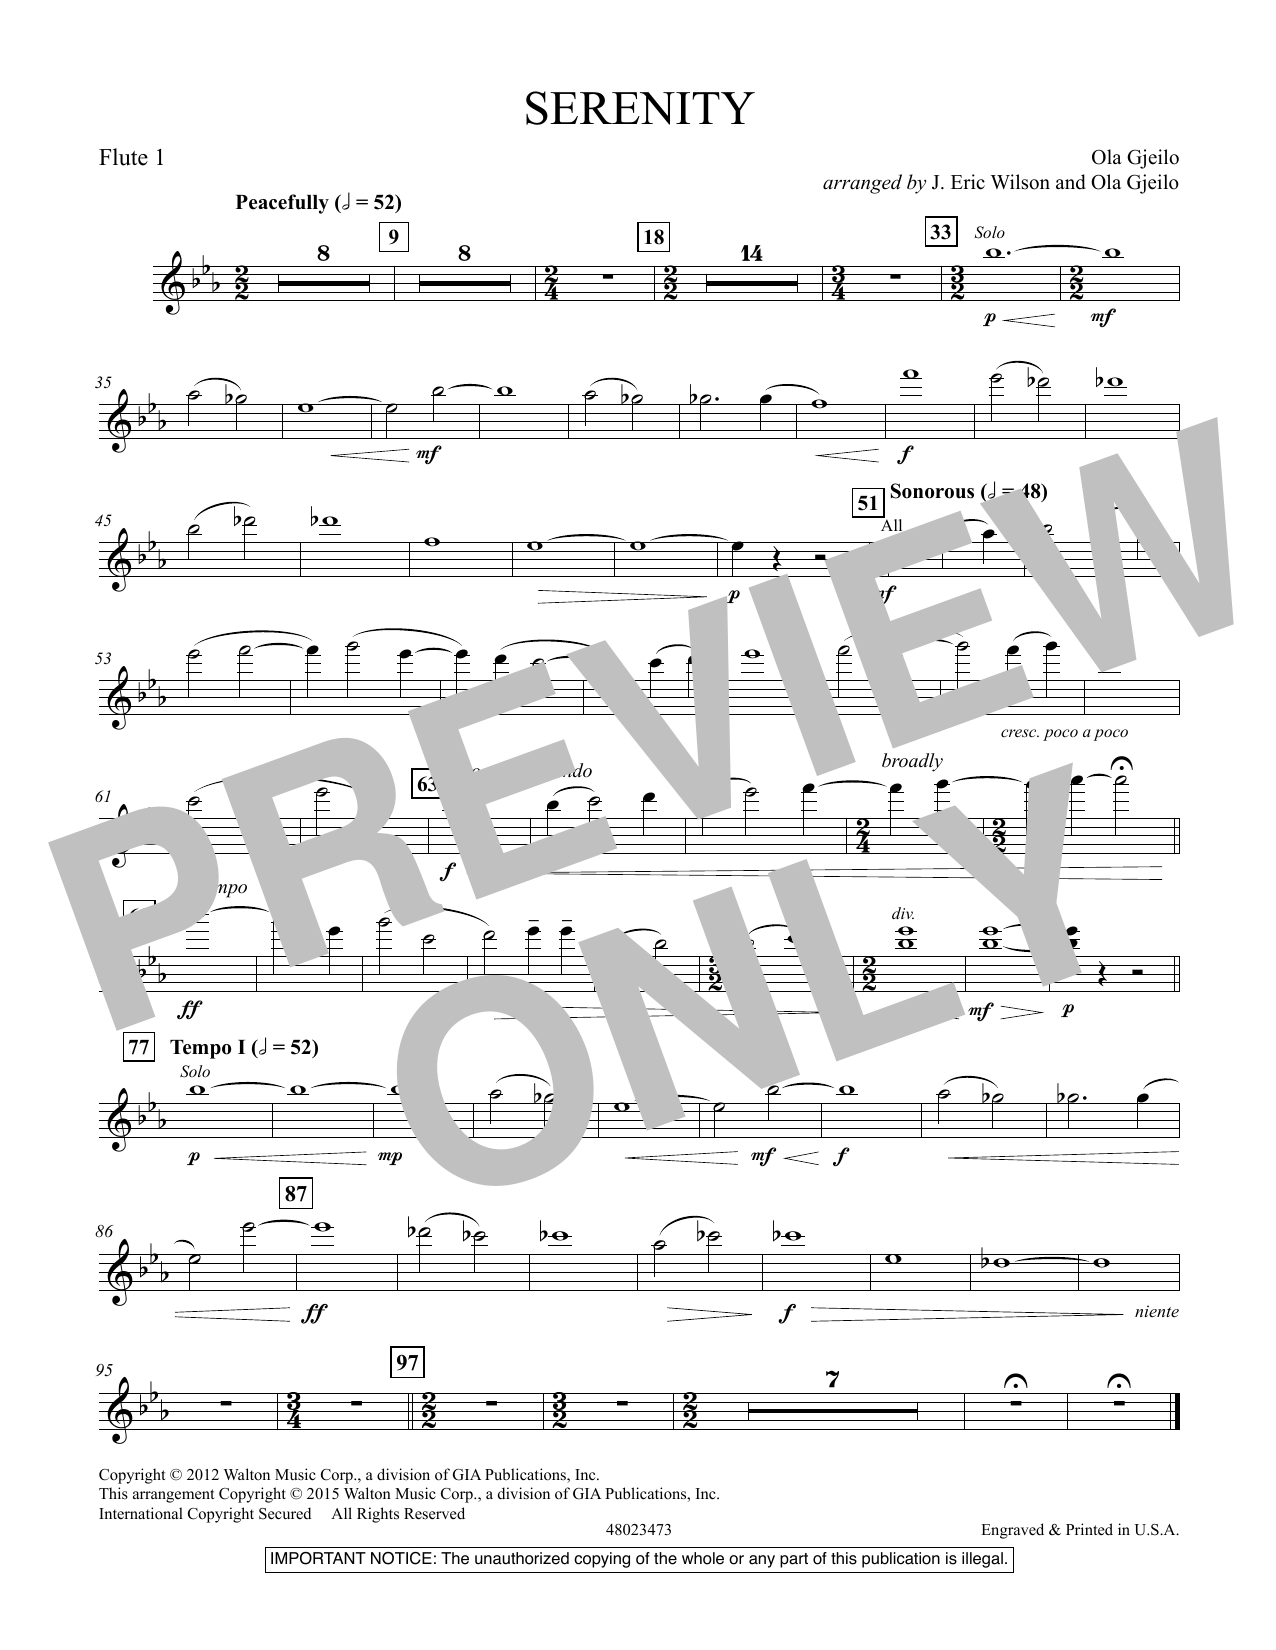 Serenity - Flute 1 (Concert Band)